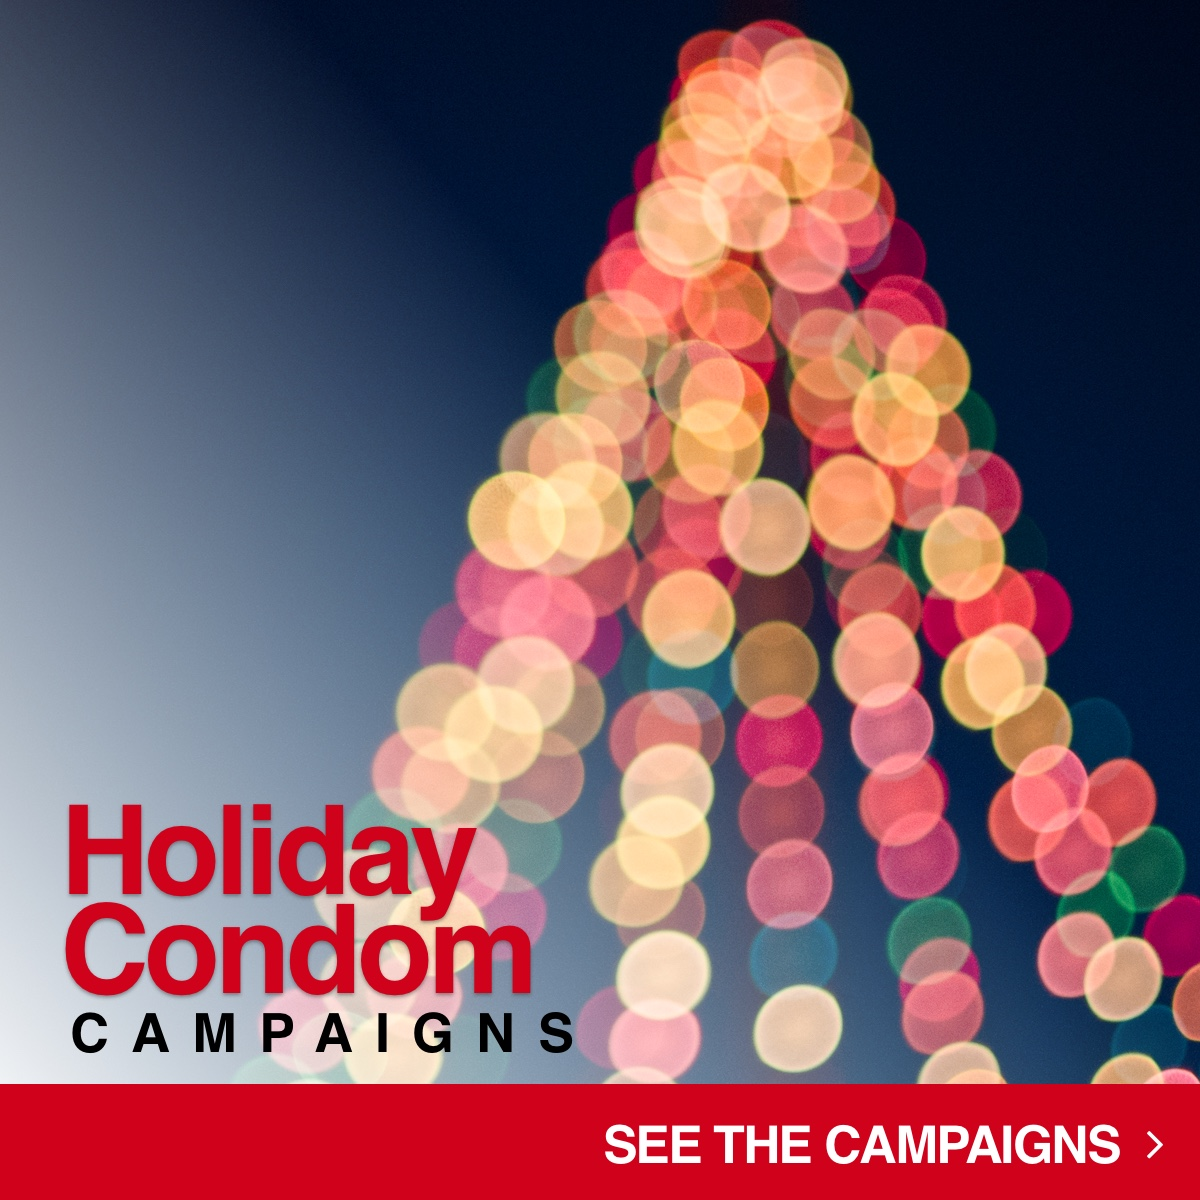 Holiday Condoms